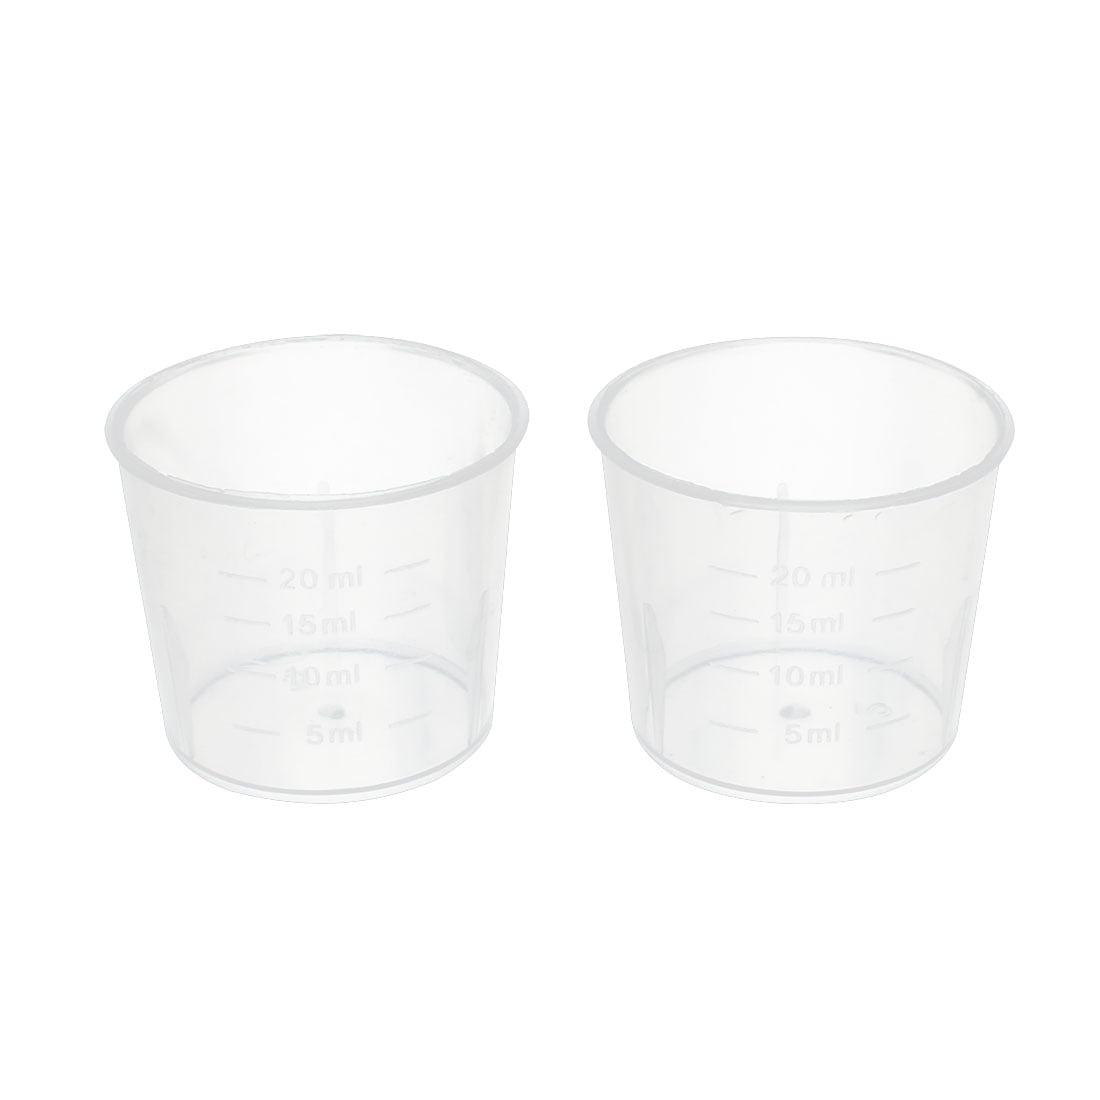 2 Pcs 20mL Laboratory Transparent Plastic Liquid Container Measuring Cup Beaker by Unique-Bargains